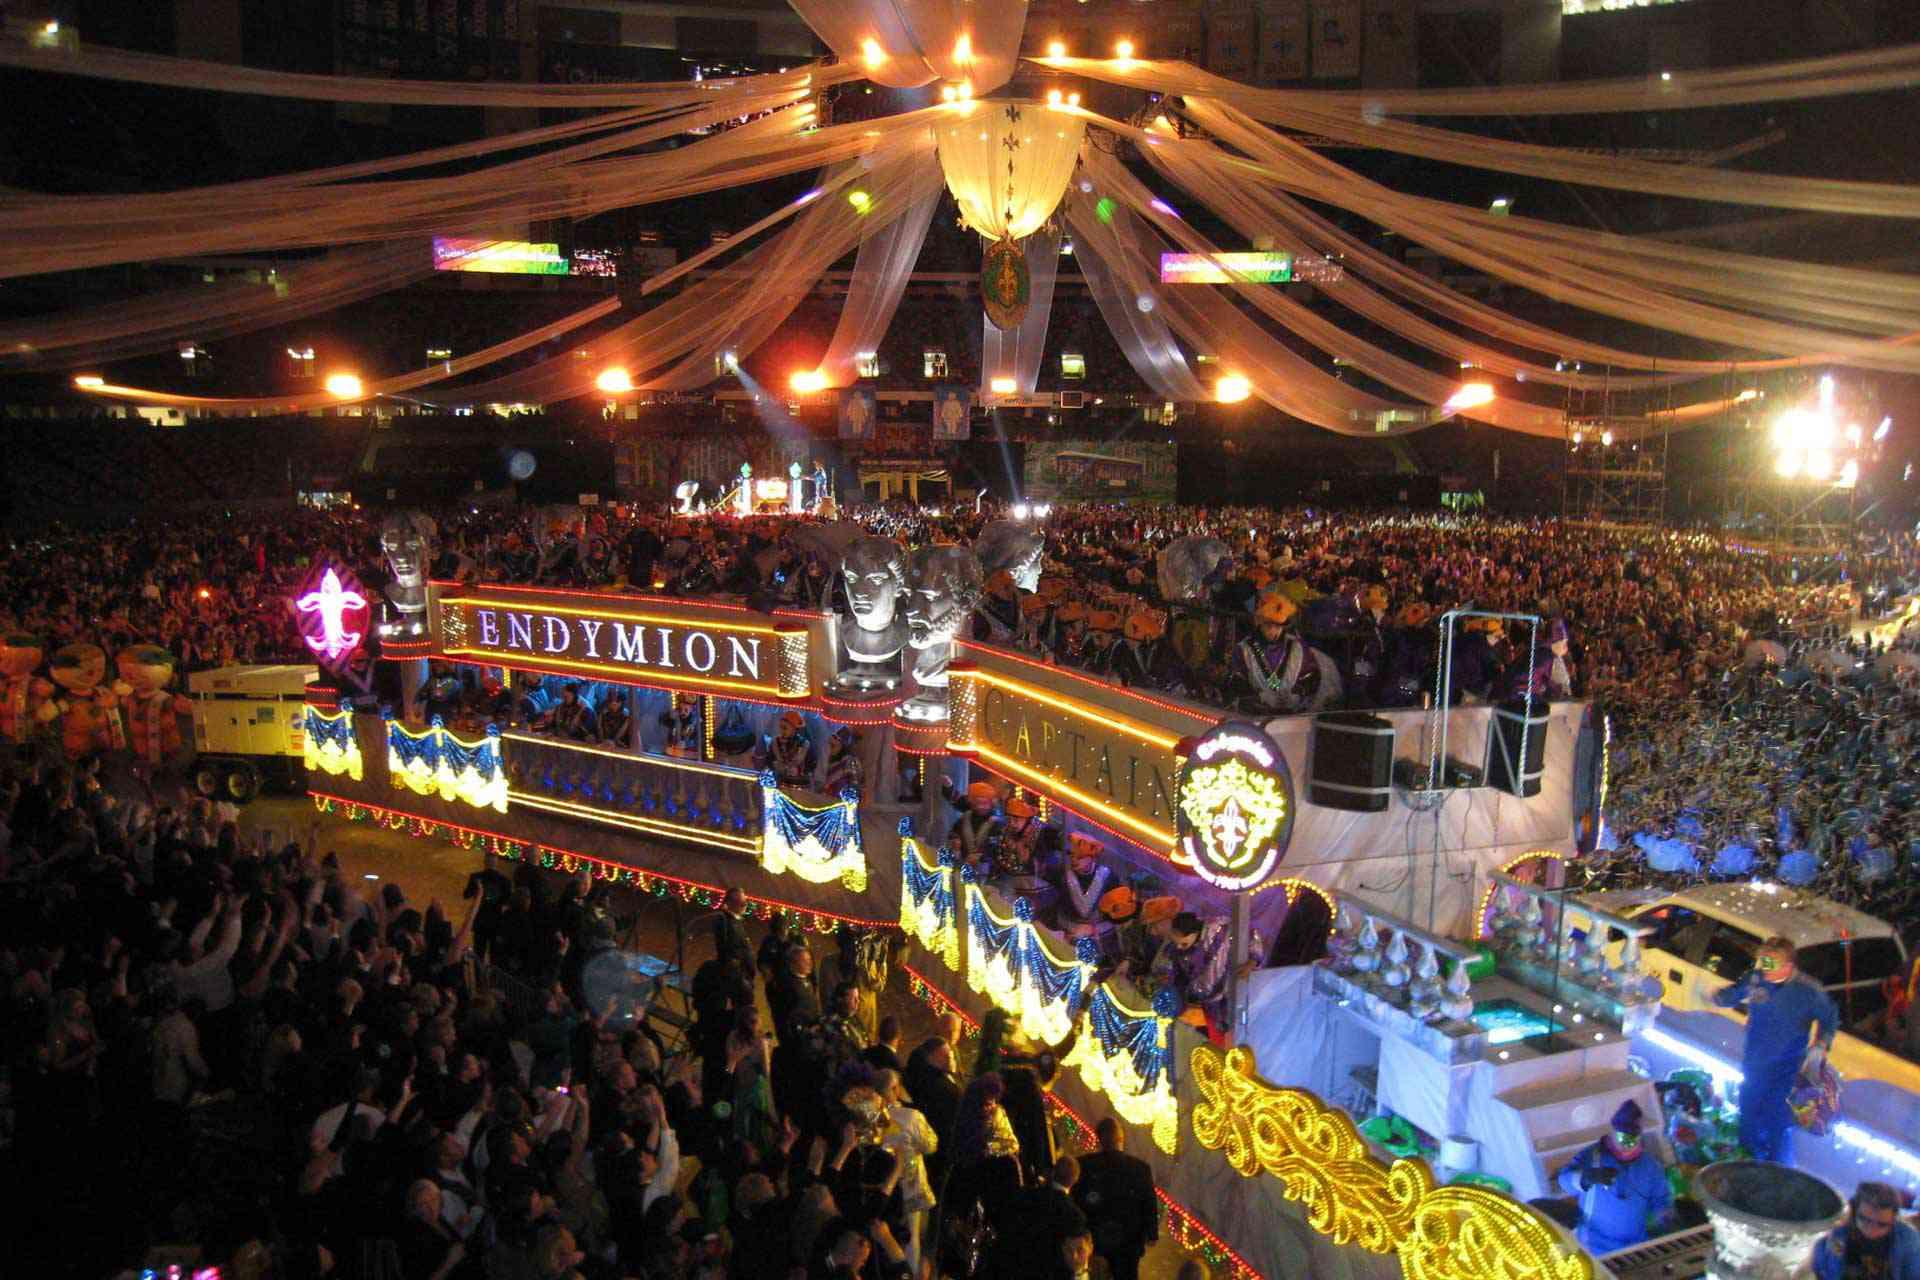 Endymion parade float